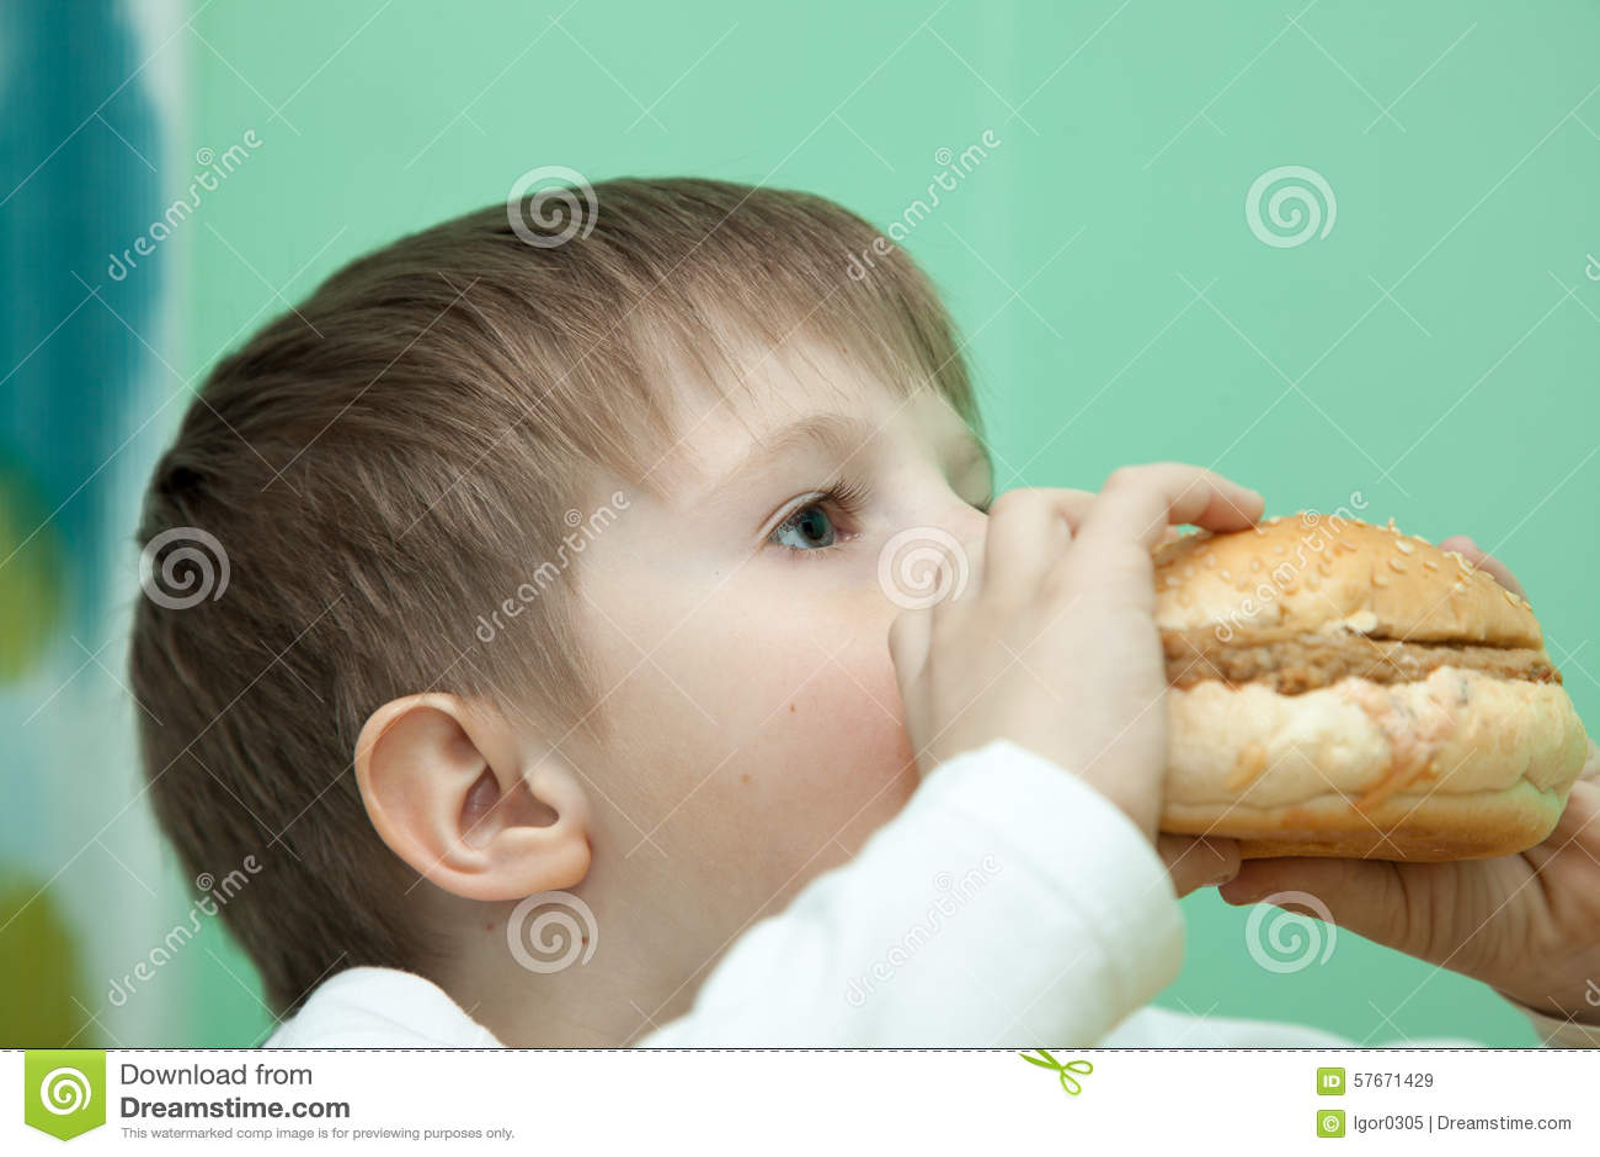 Chłopiec z hamburgerem